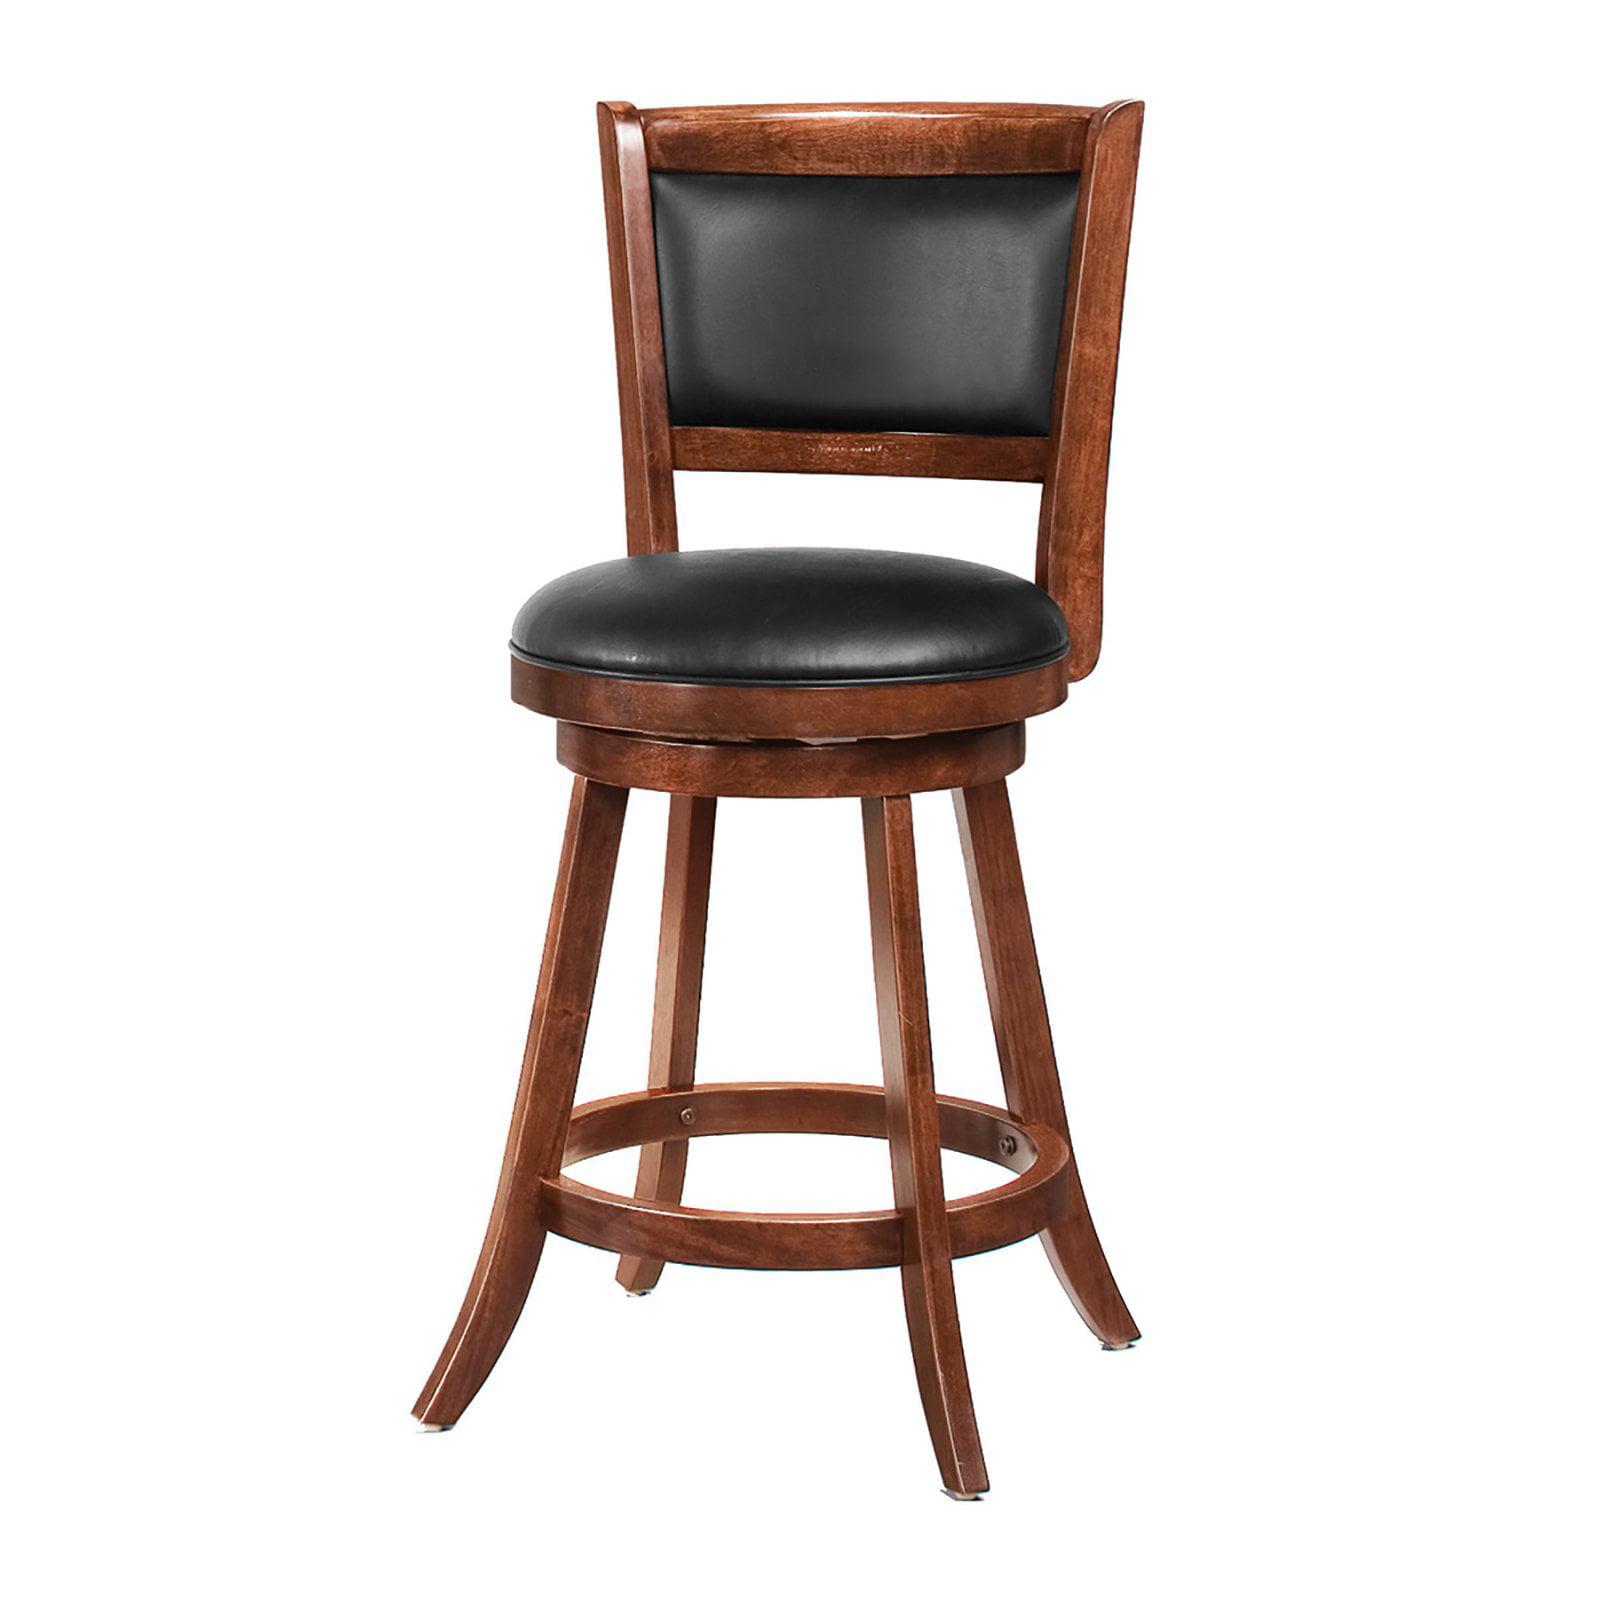 Coaster Furniture Corning Swivel Bar Stool Set of 2 by Overstock